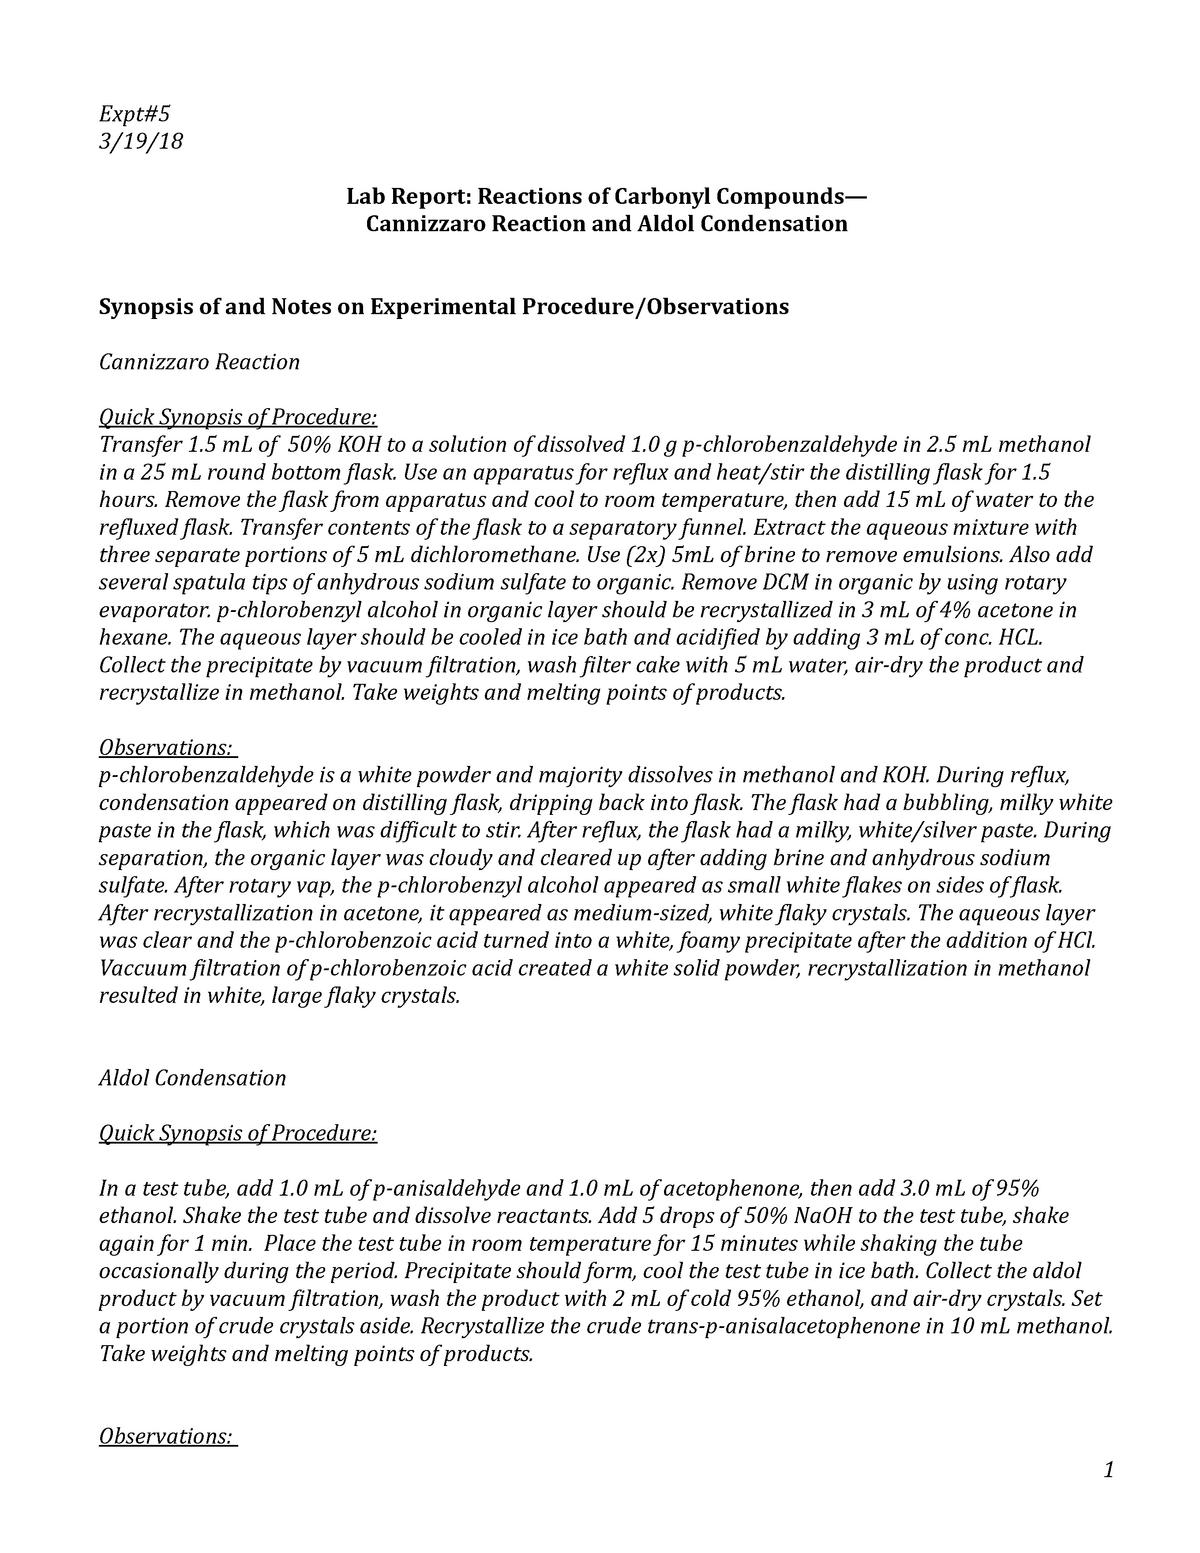 aldol condensation lab report abstract